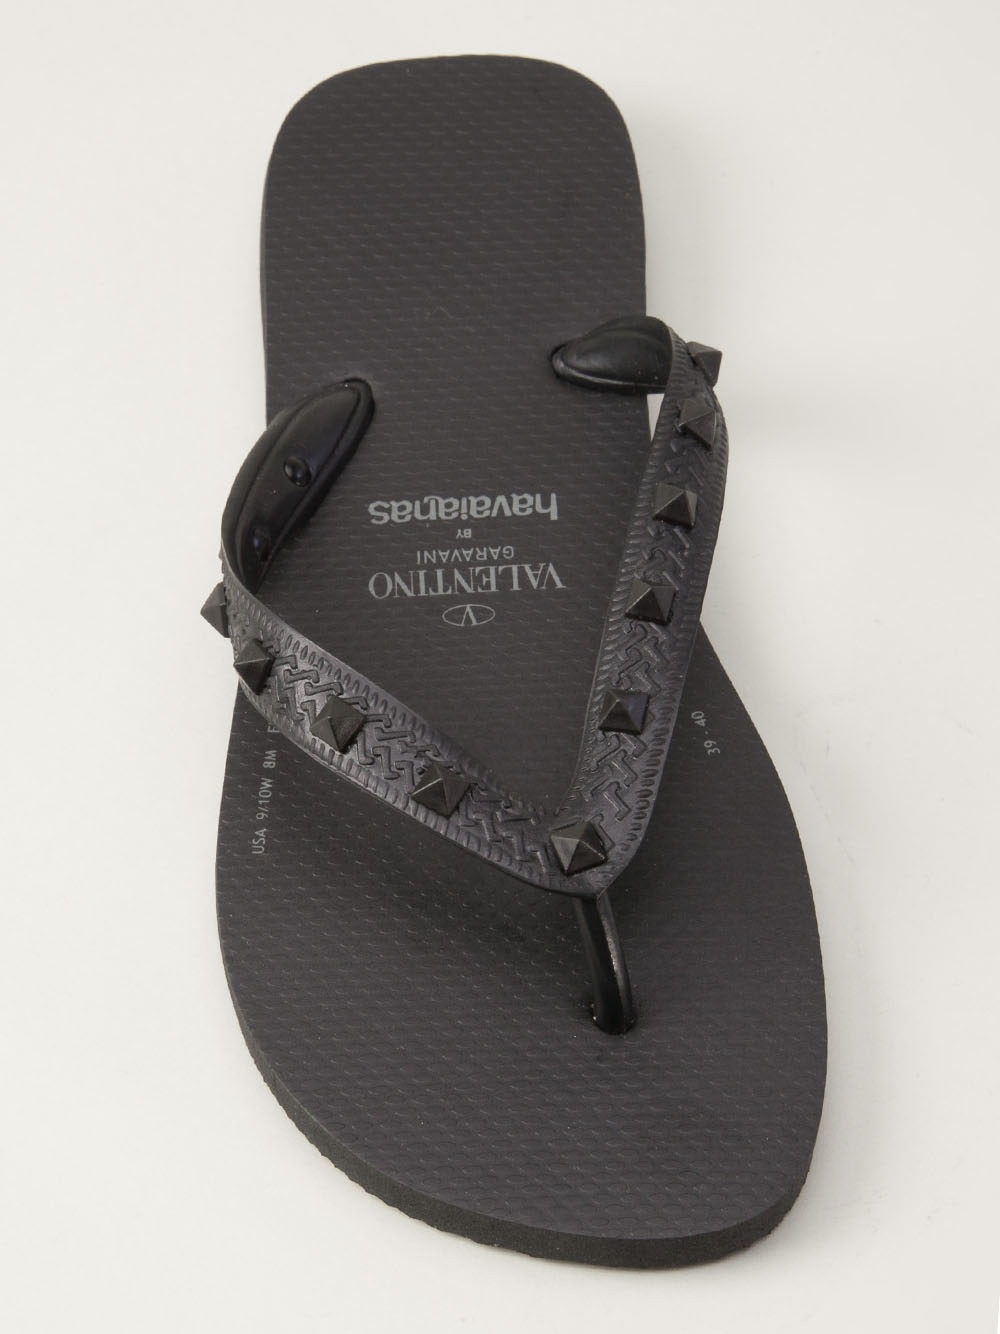 Lyst - Valentino Rockstud Flip Flop In Black For Men-1085